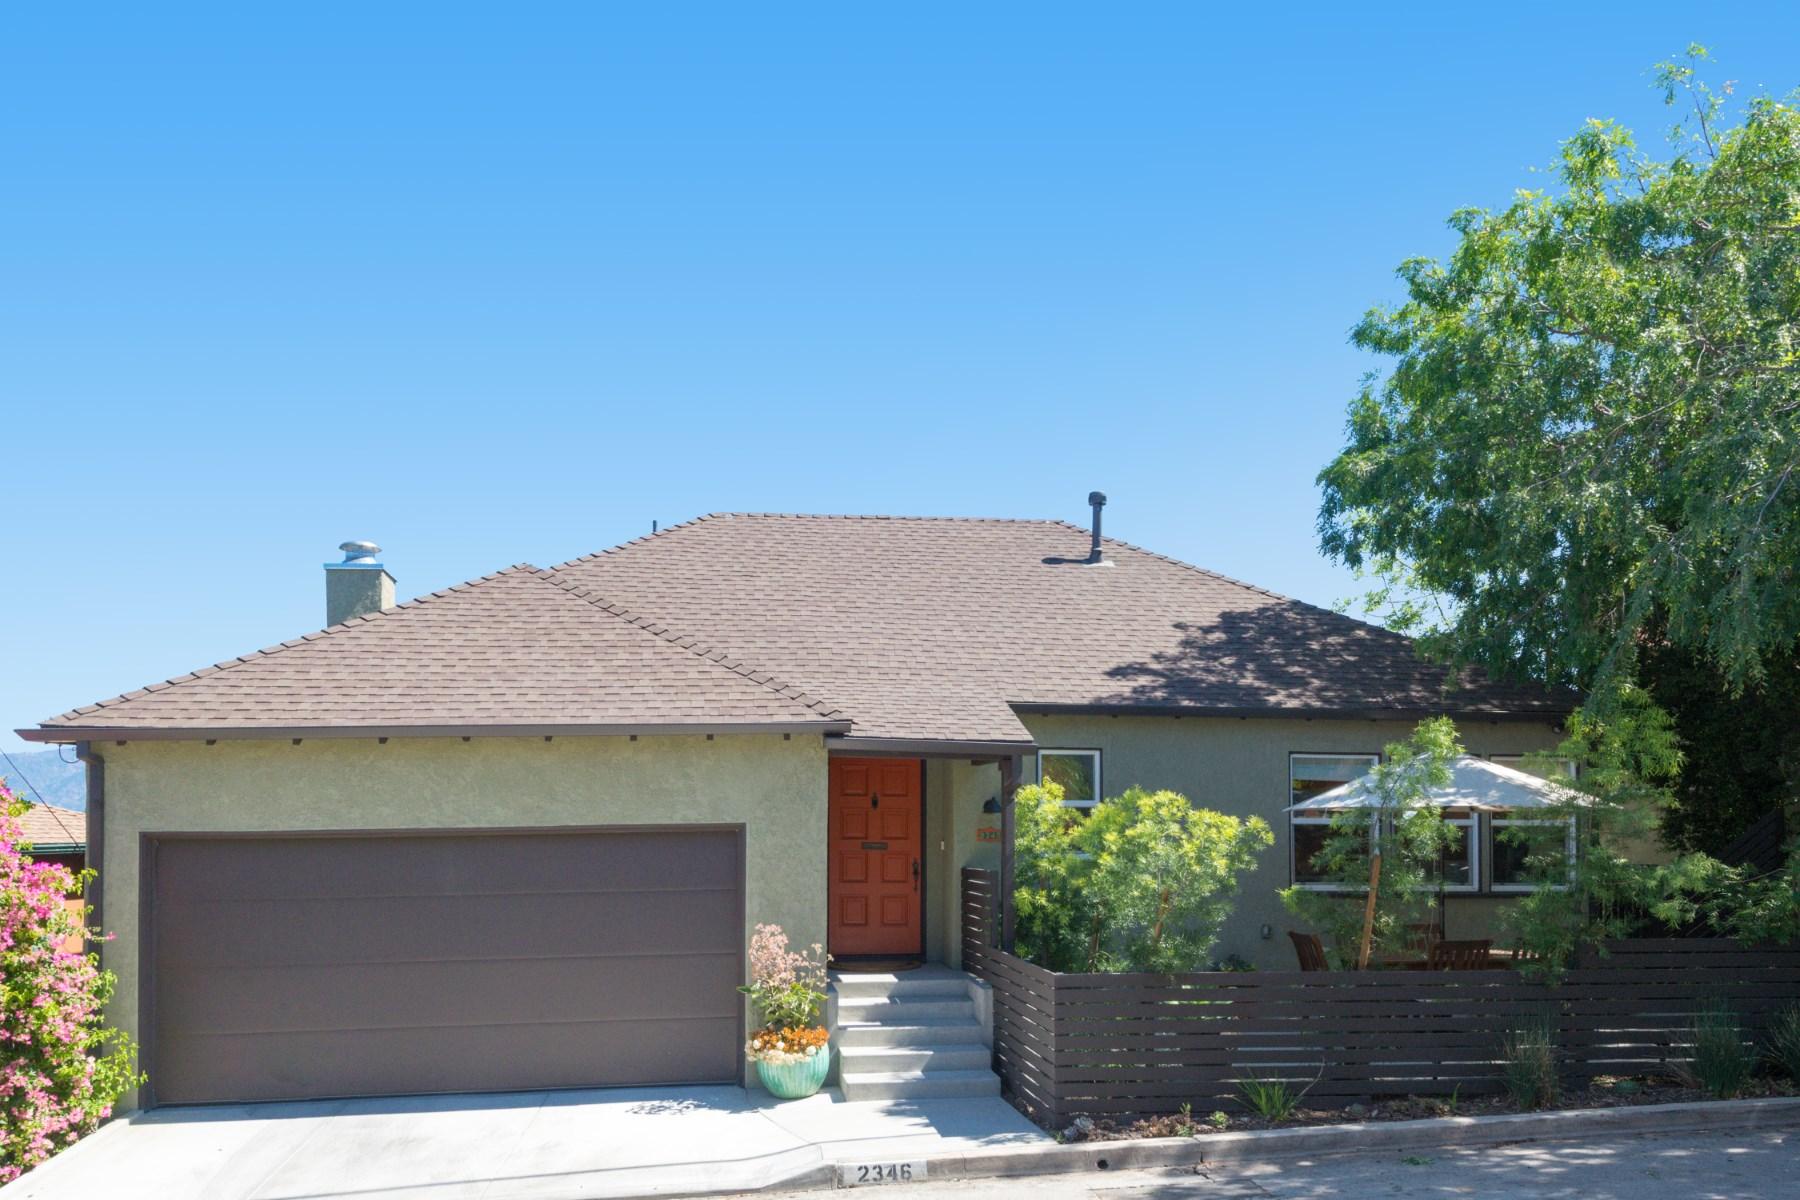 Single Family Home for Sale at 2346 Ronda Vista Drive Los Feliz, Los Angeles, California, 90027 United States